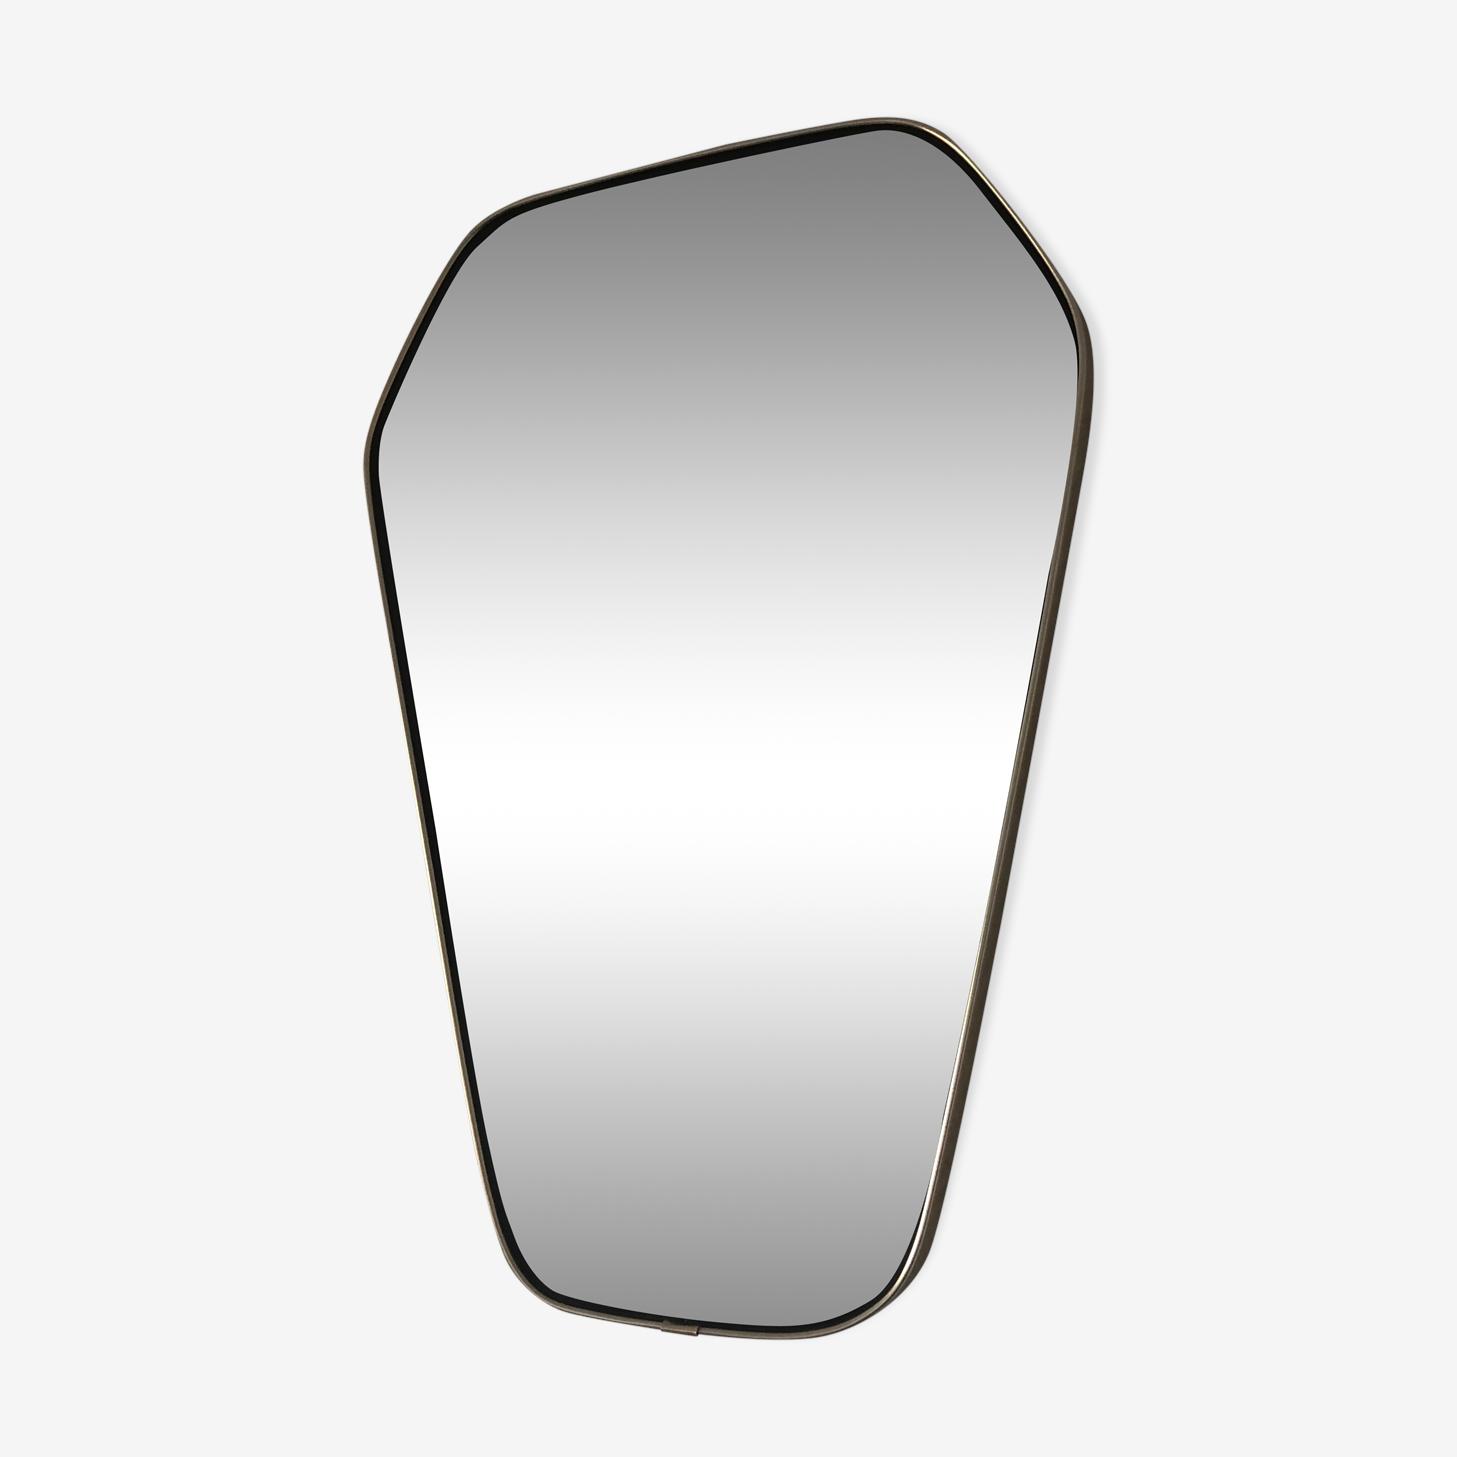 Miroir rétroviseur hexagonal 49x33cm vintage 1960